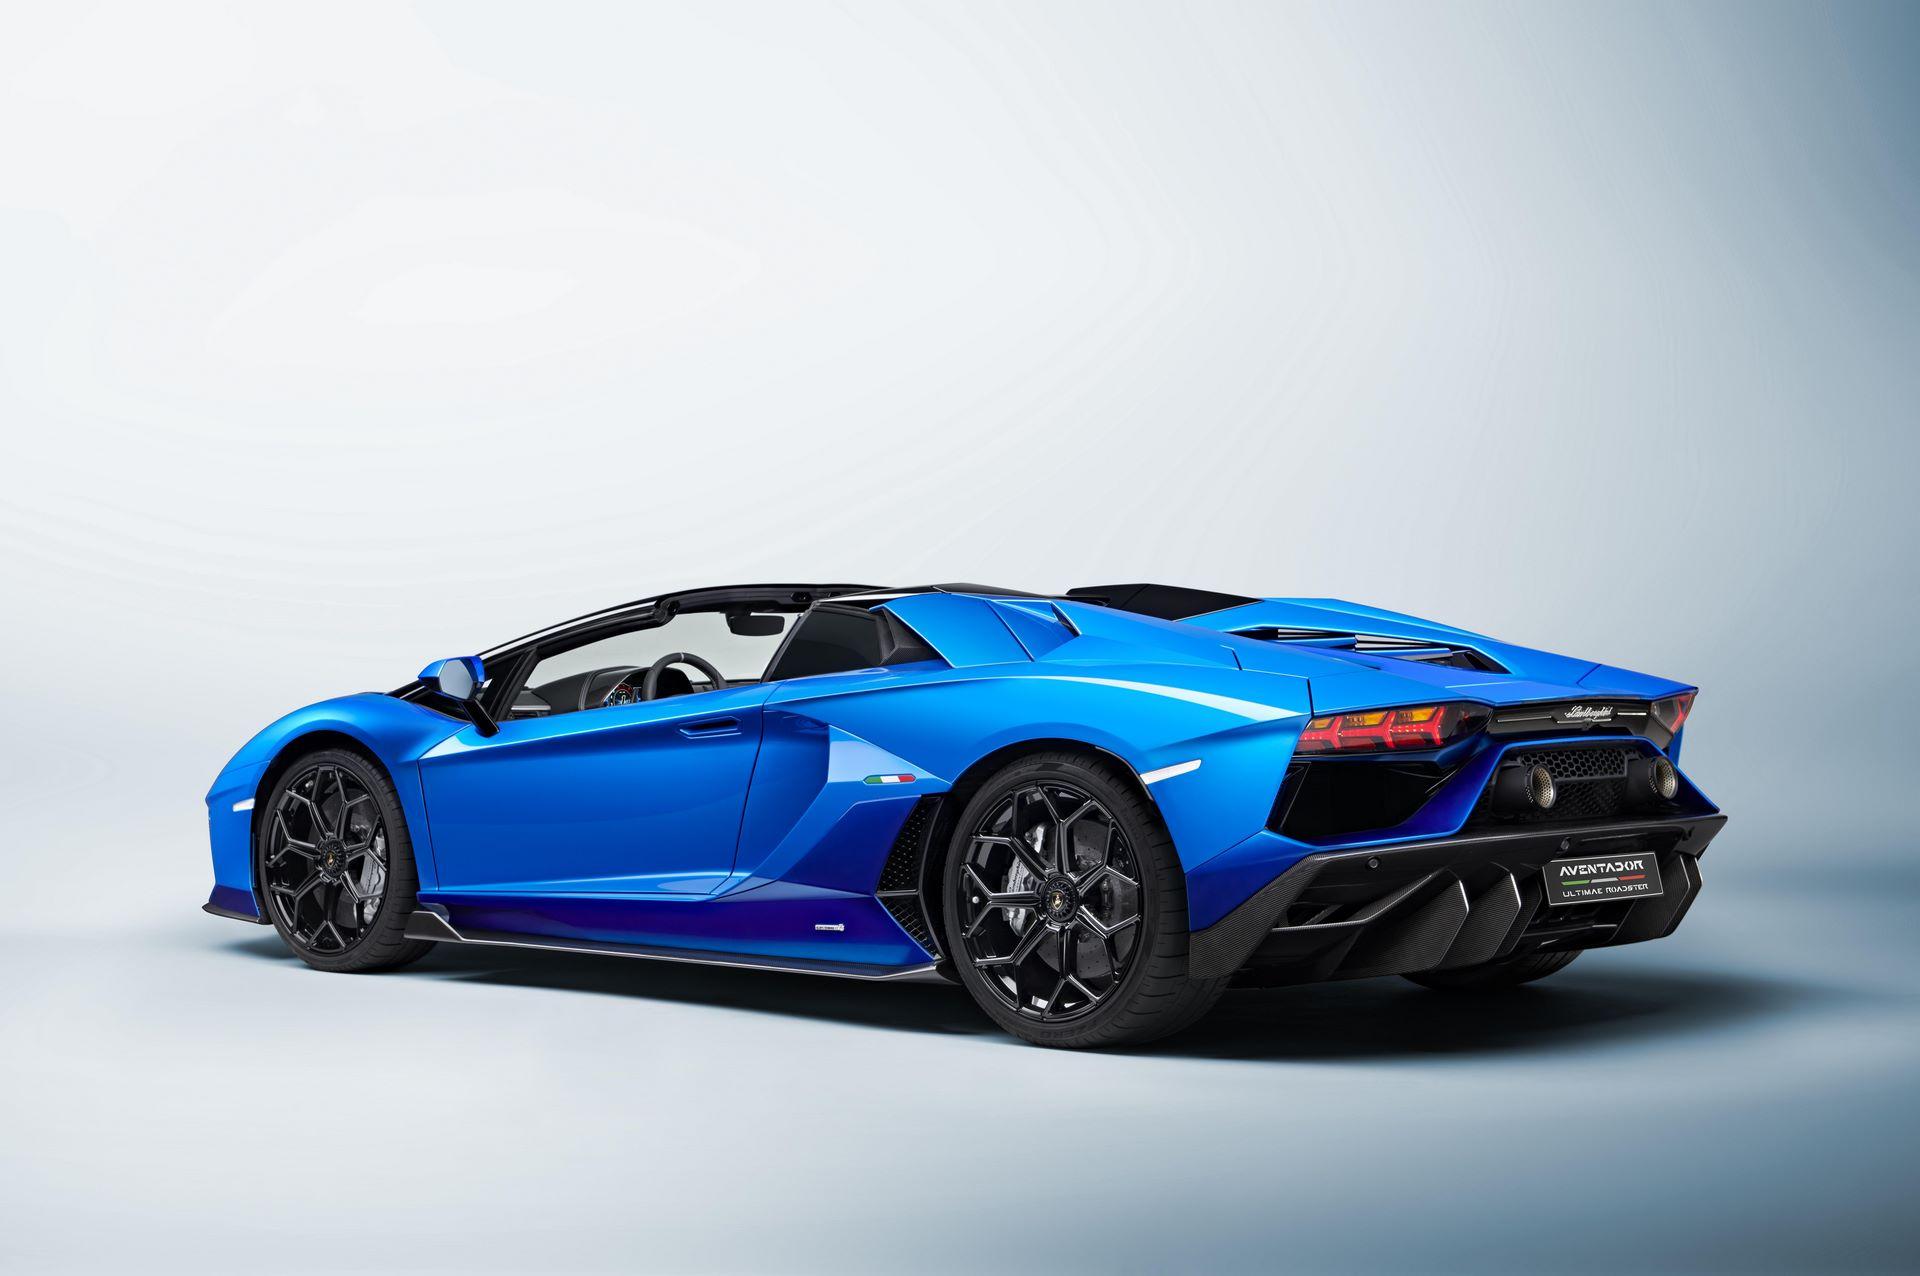 Lamborghini-Aventador-LP780-4-Ultimae-37